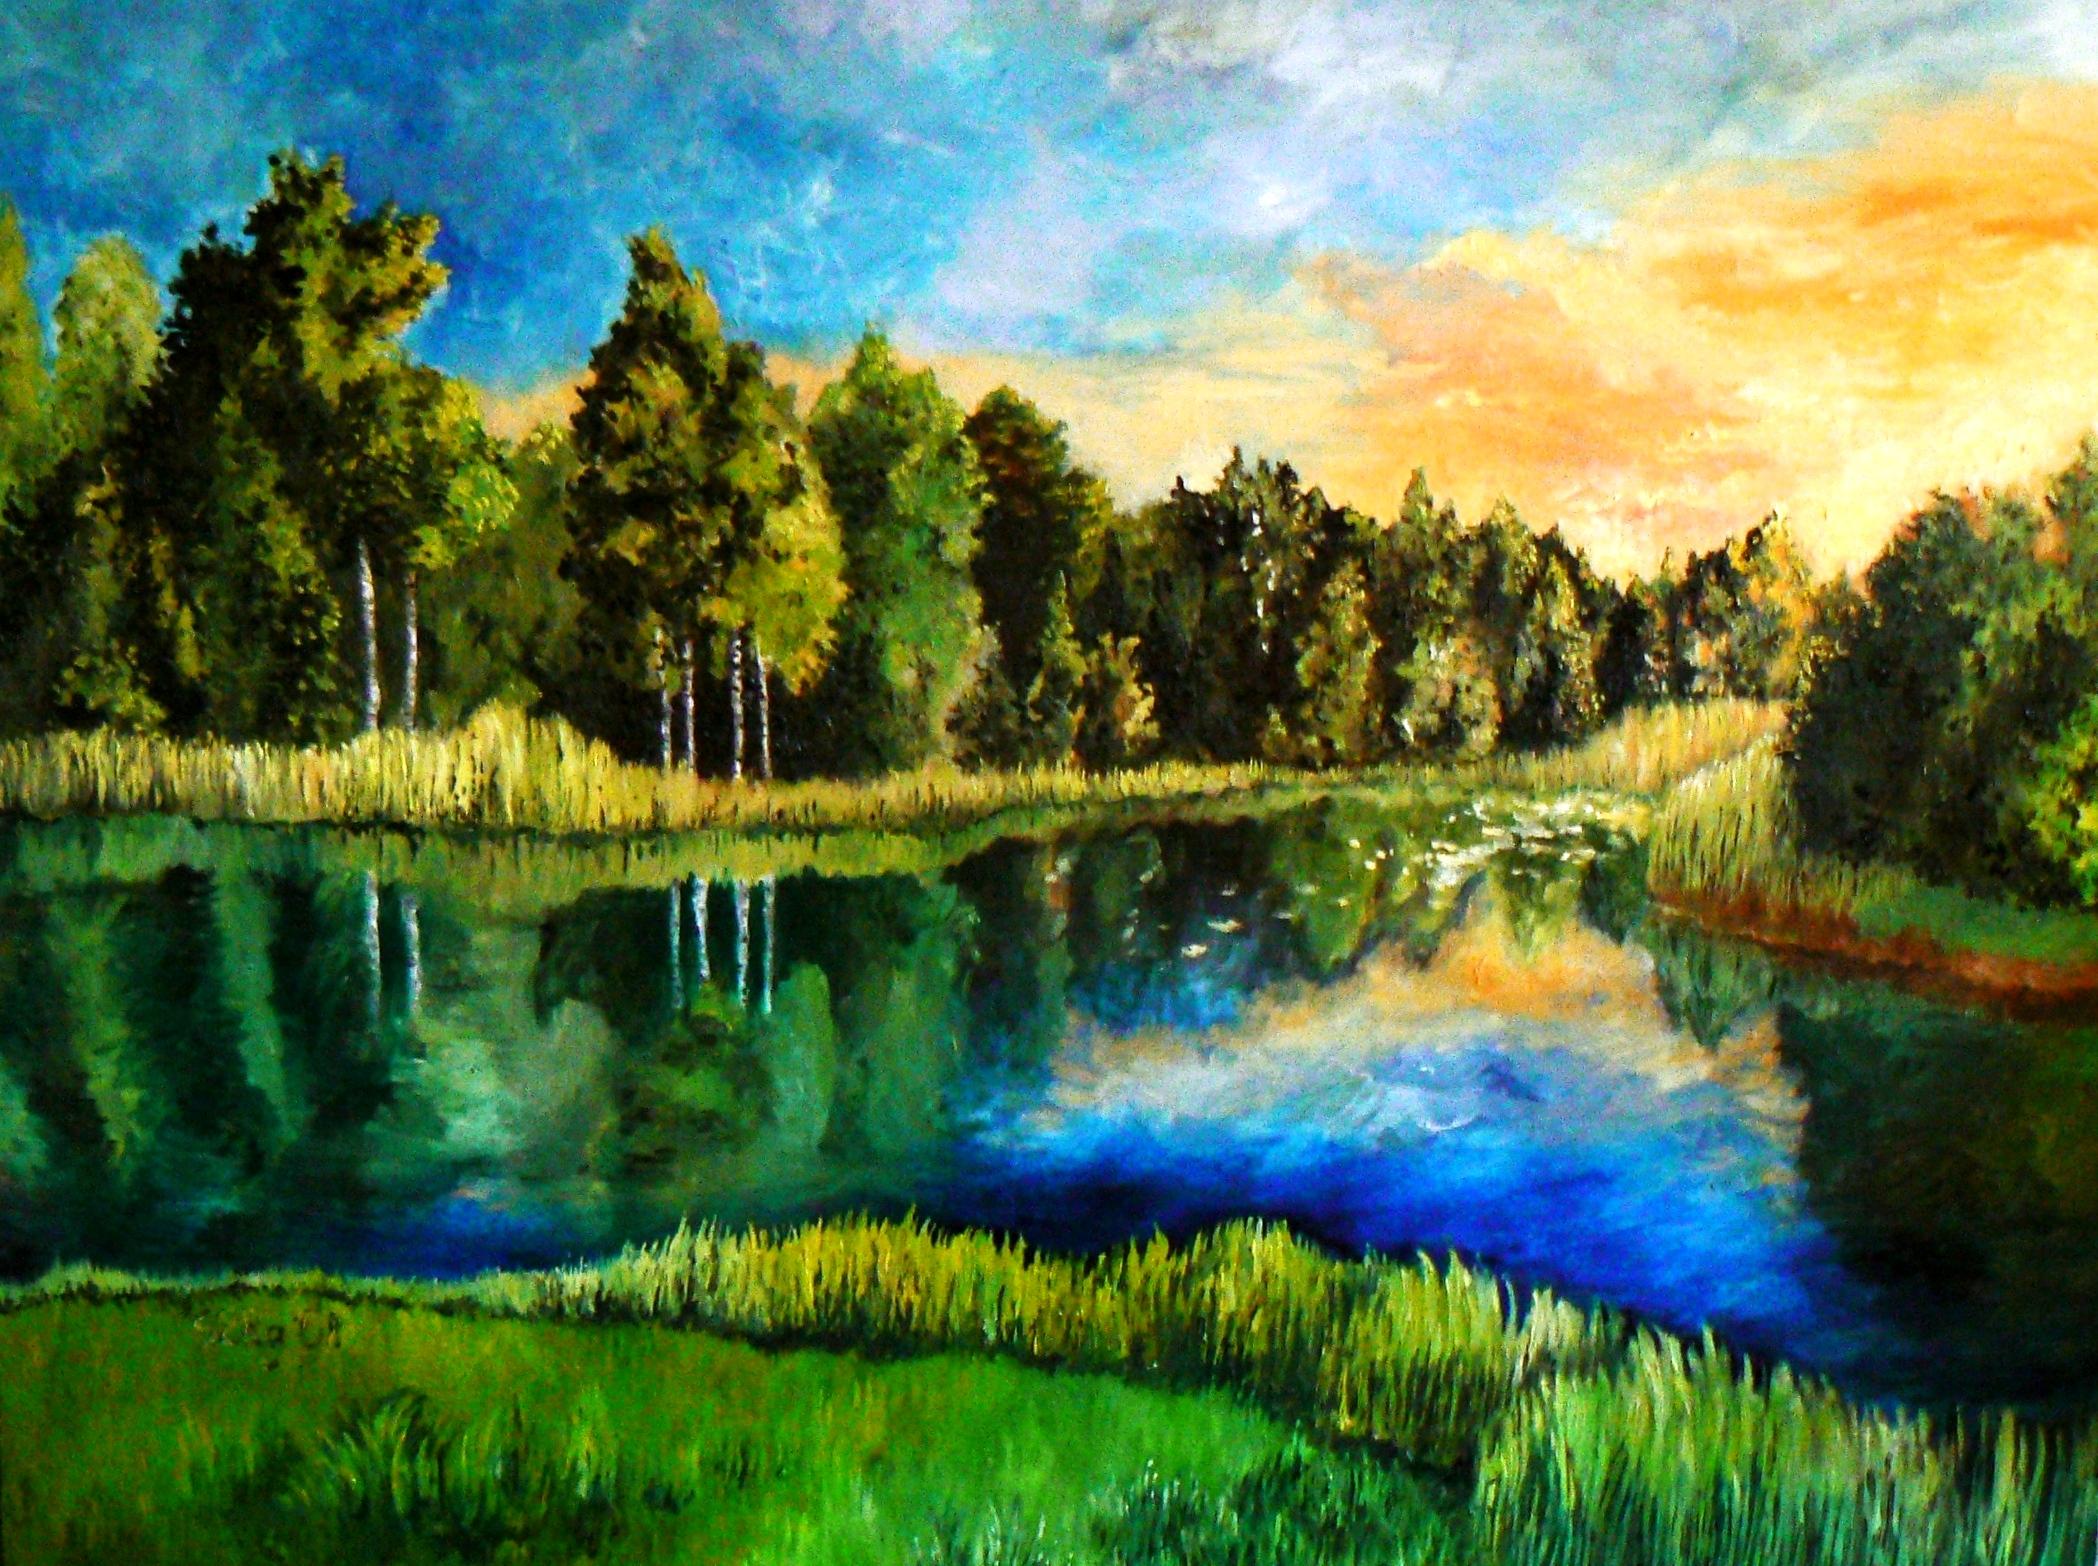 Estonian landscape by DoodleWithGlueGun on DeviantArt